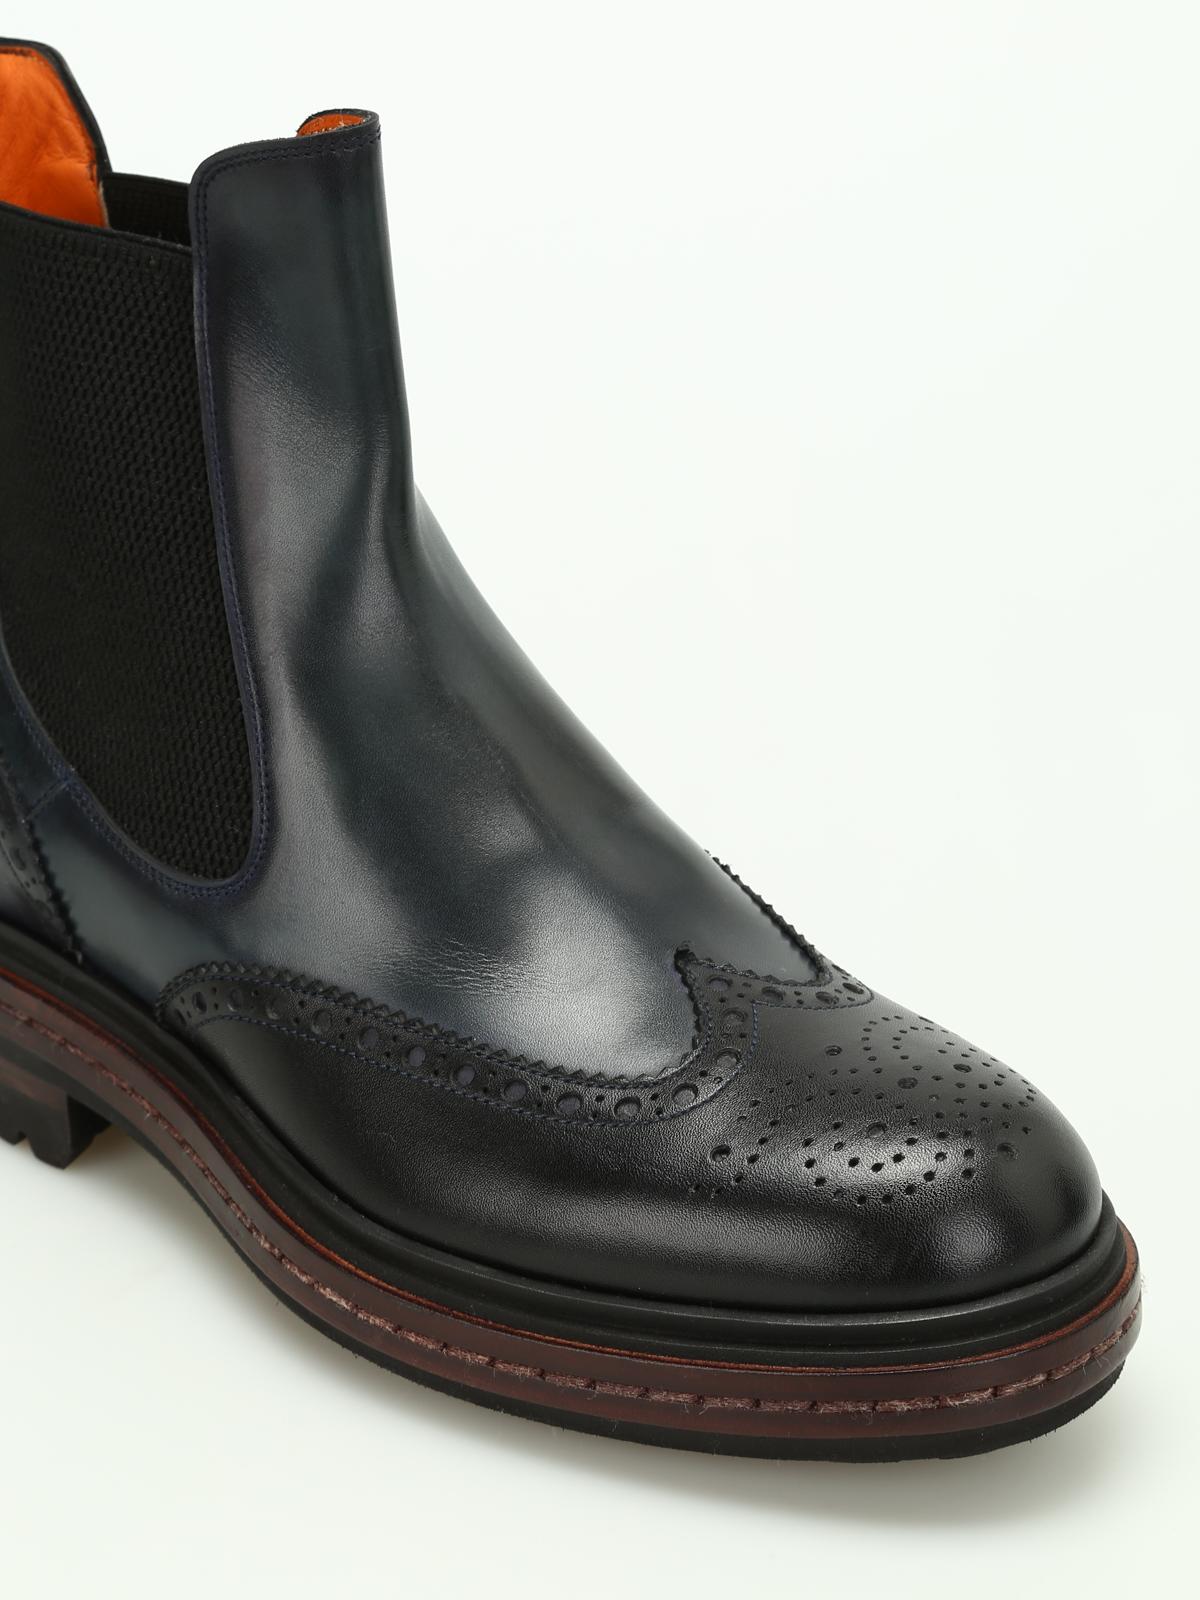 e9e5247b2cdb iKRIX SANTONI  ankle boots - Two-tone leather Chelsea boots